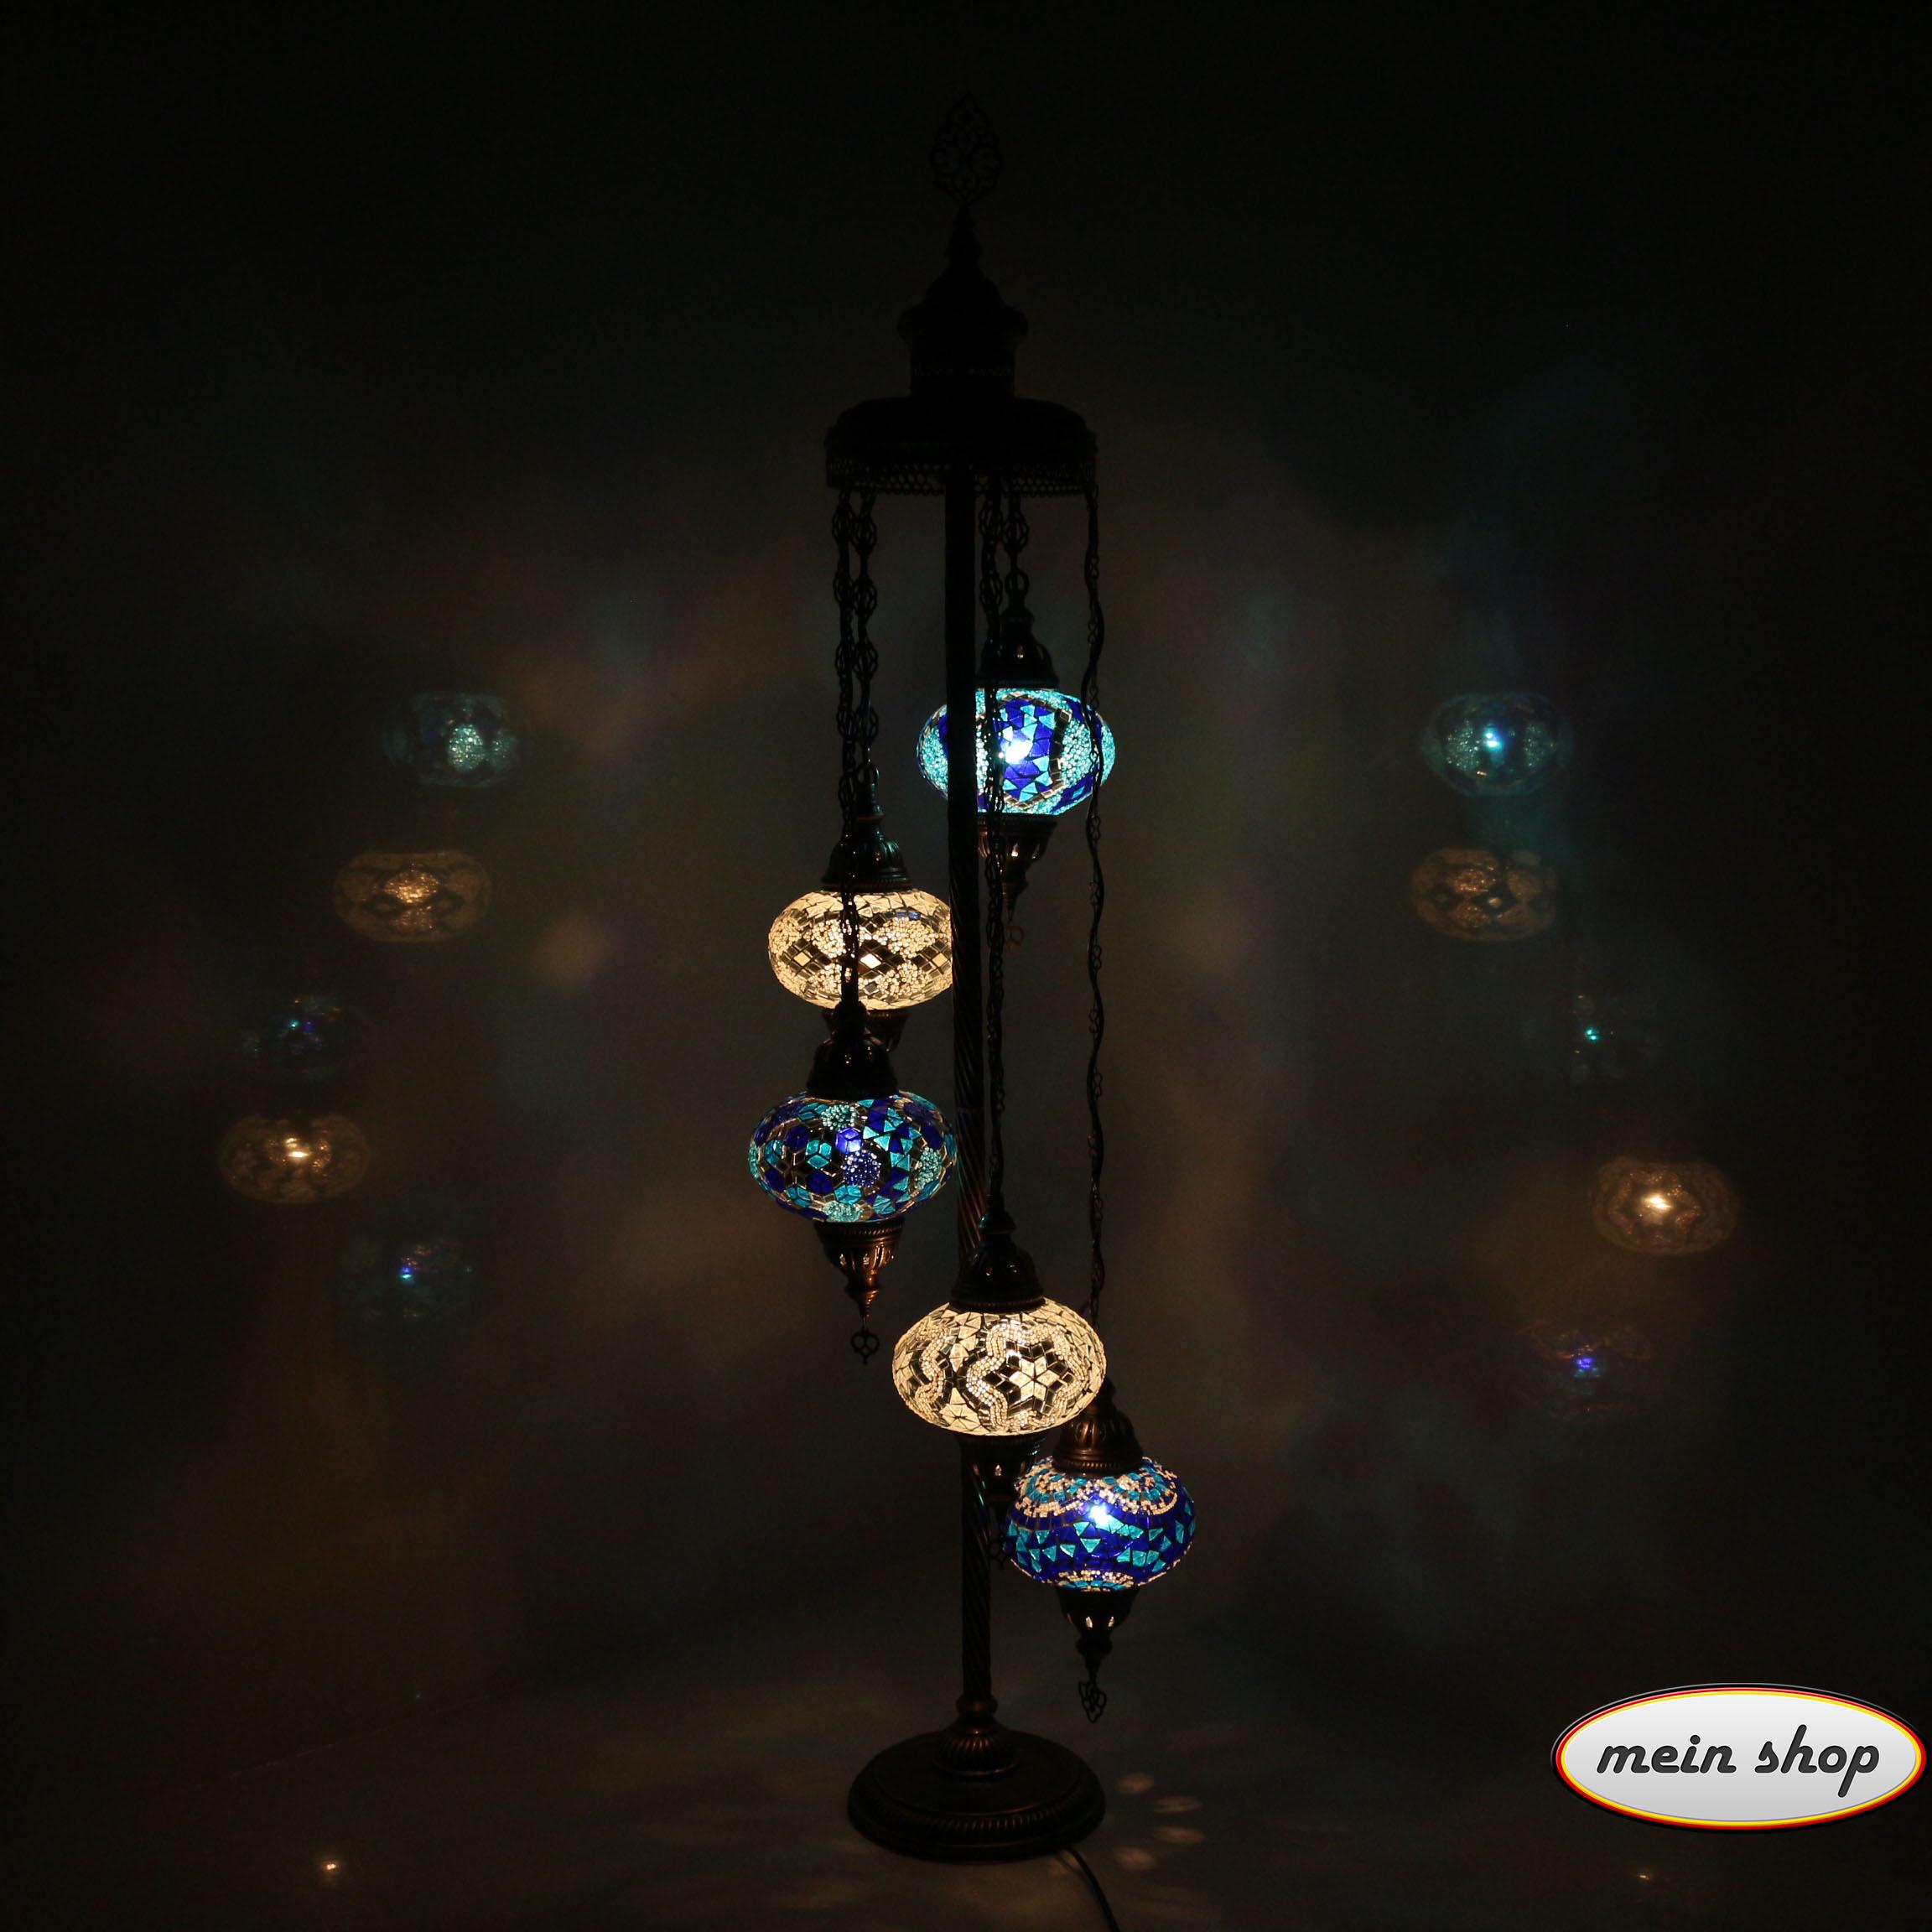 mosaik stehlampe mit 5 l kugeln blau wei mein shop. Black Bedroom Furniture Sets. Home Design Ideas